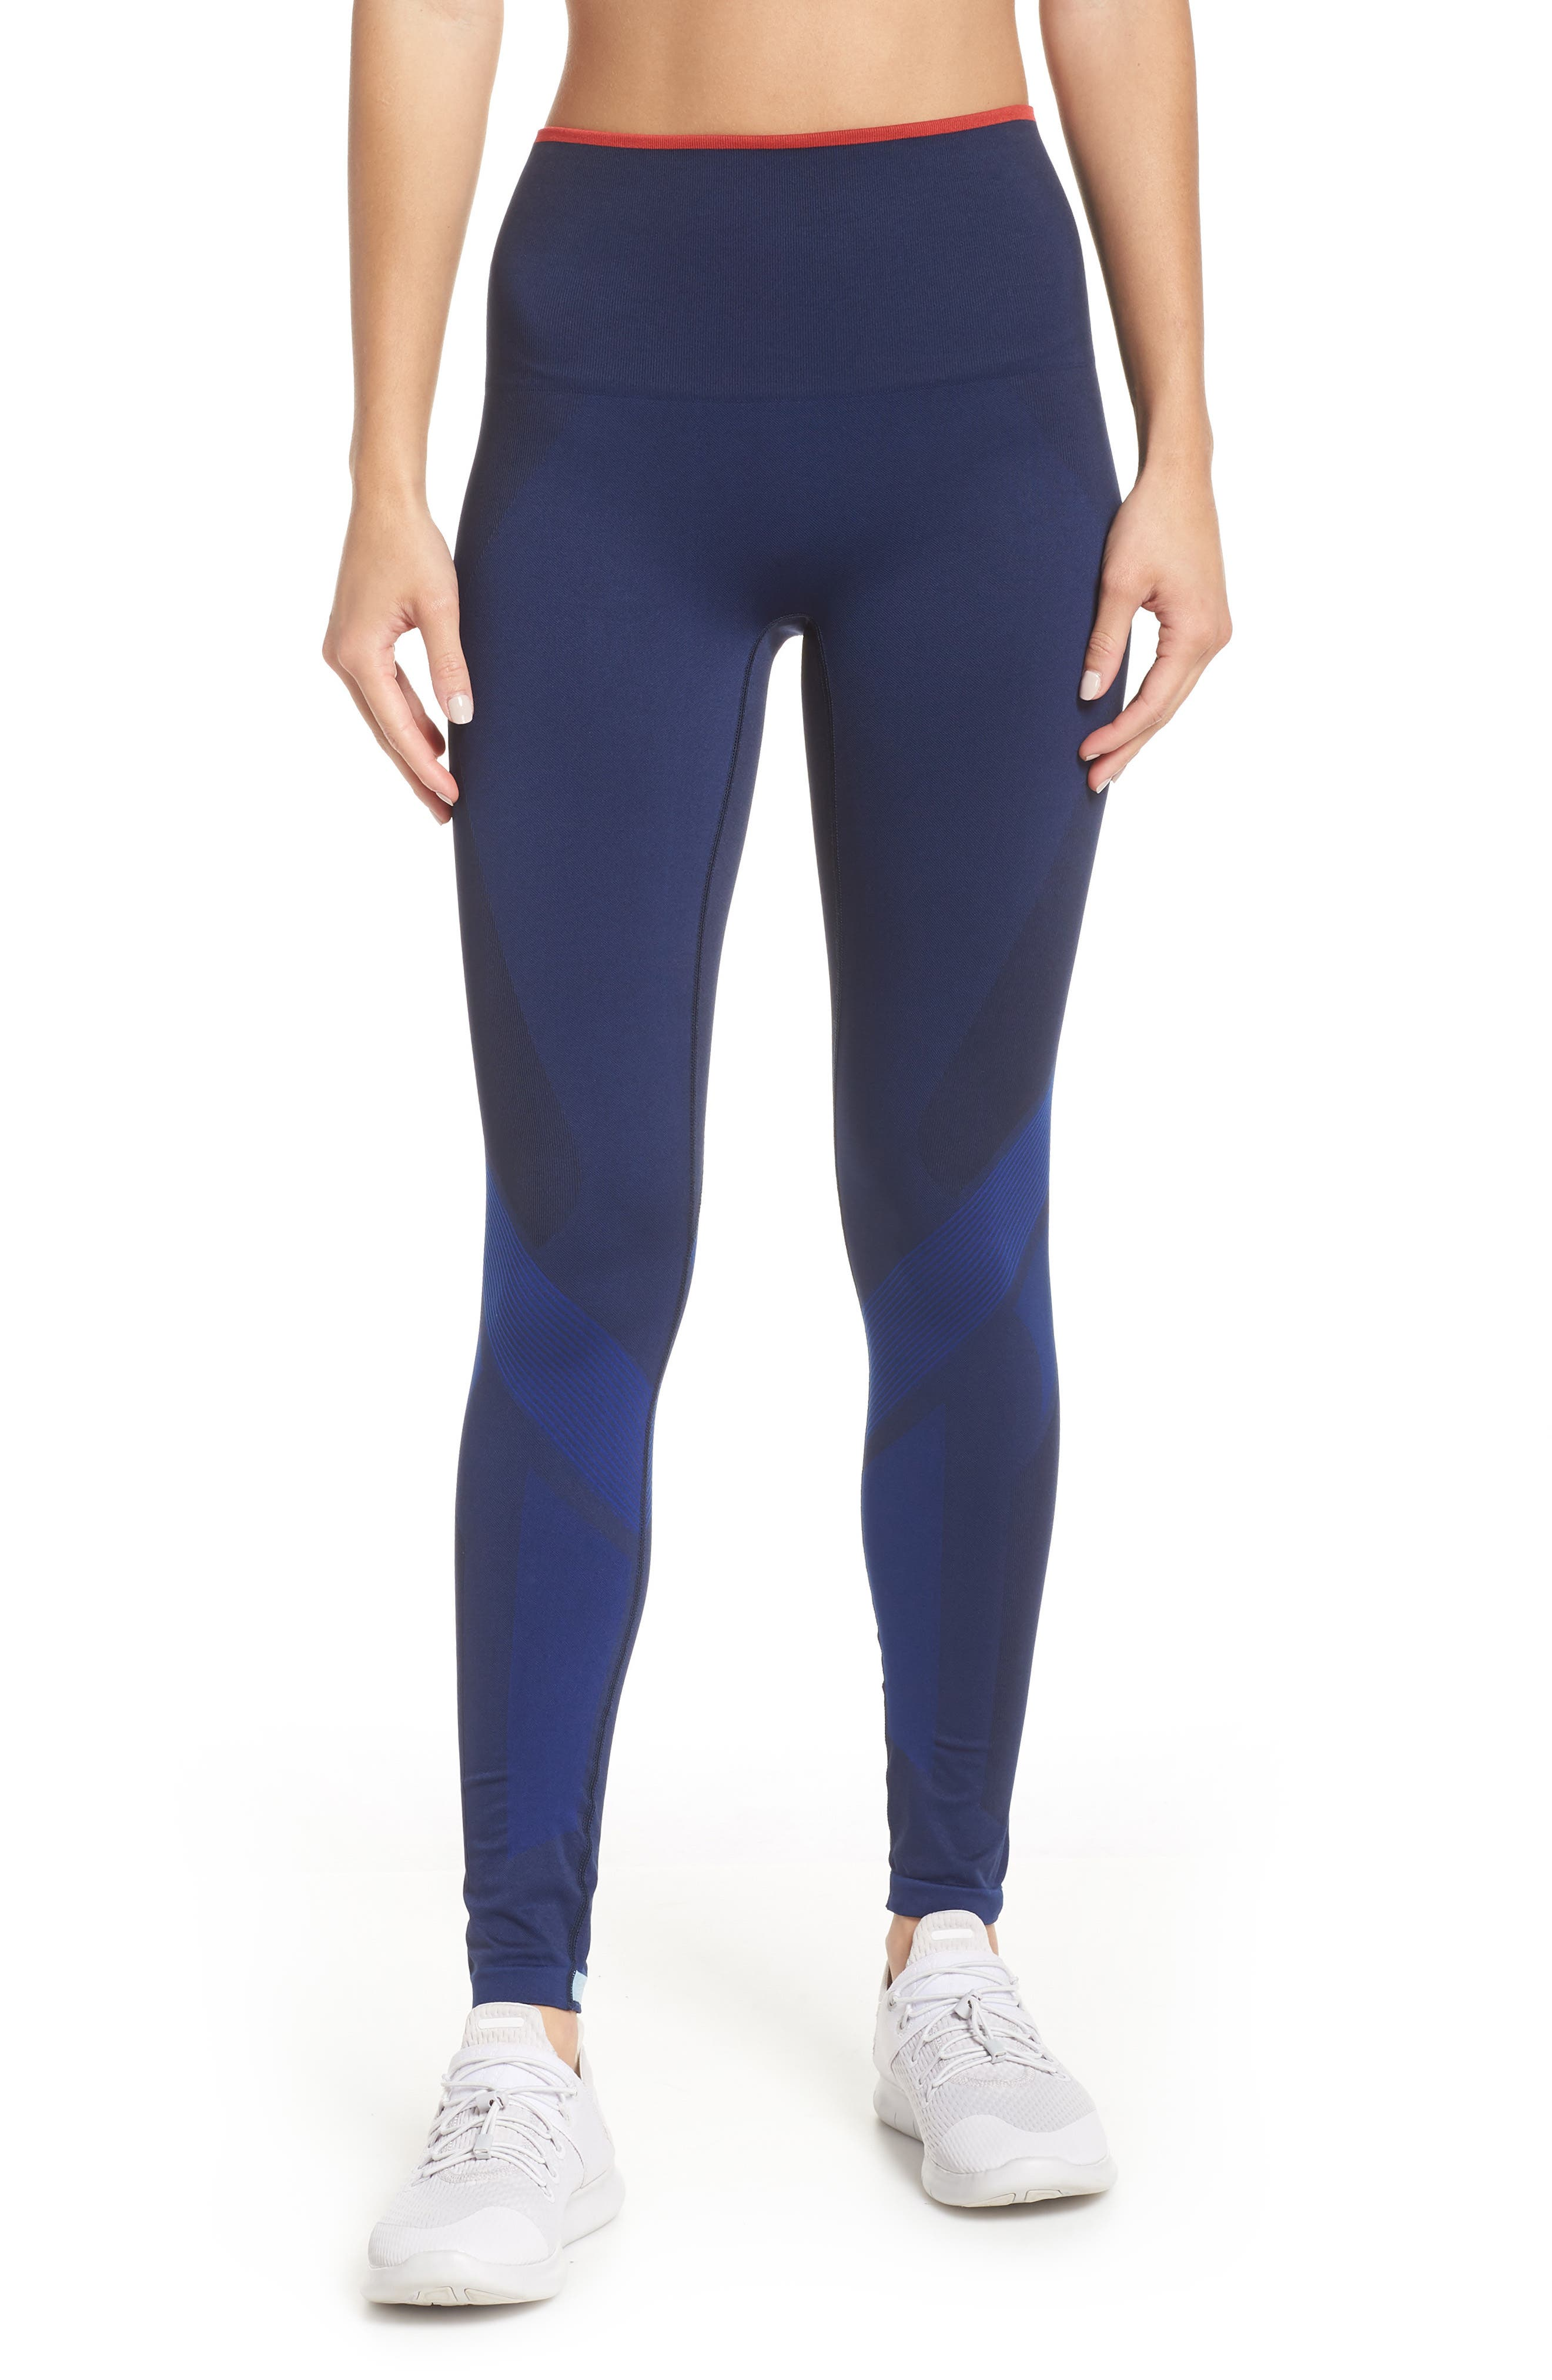 Motion High Waist Seamless Leggings,                         Main,                         color, NAVY / BLUE